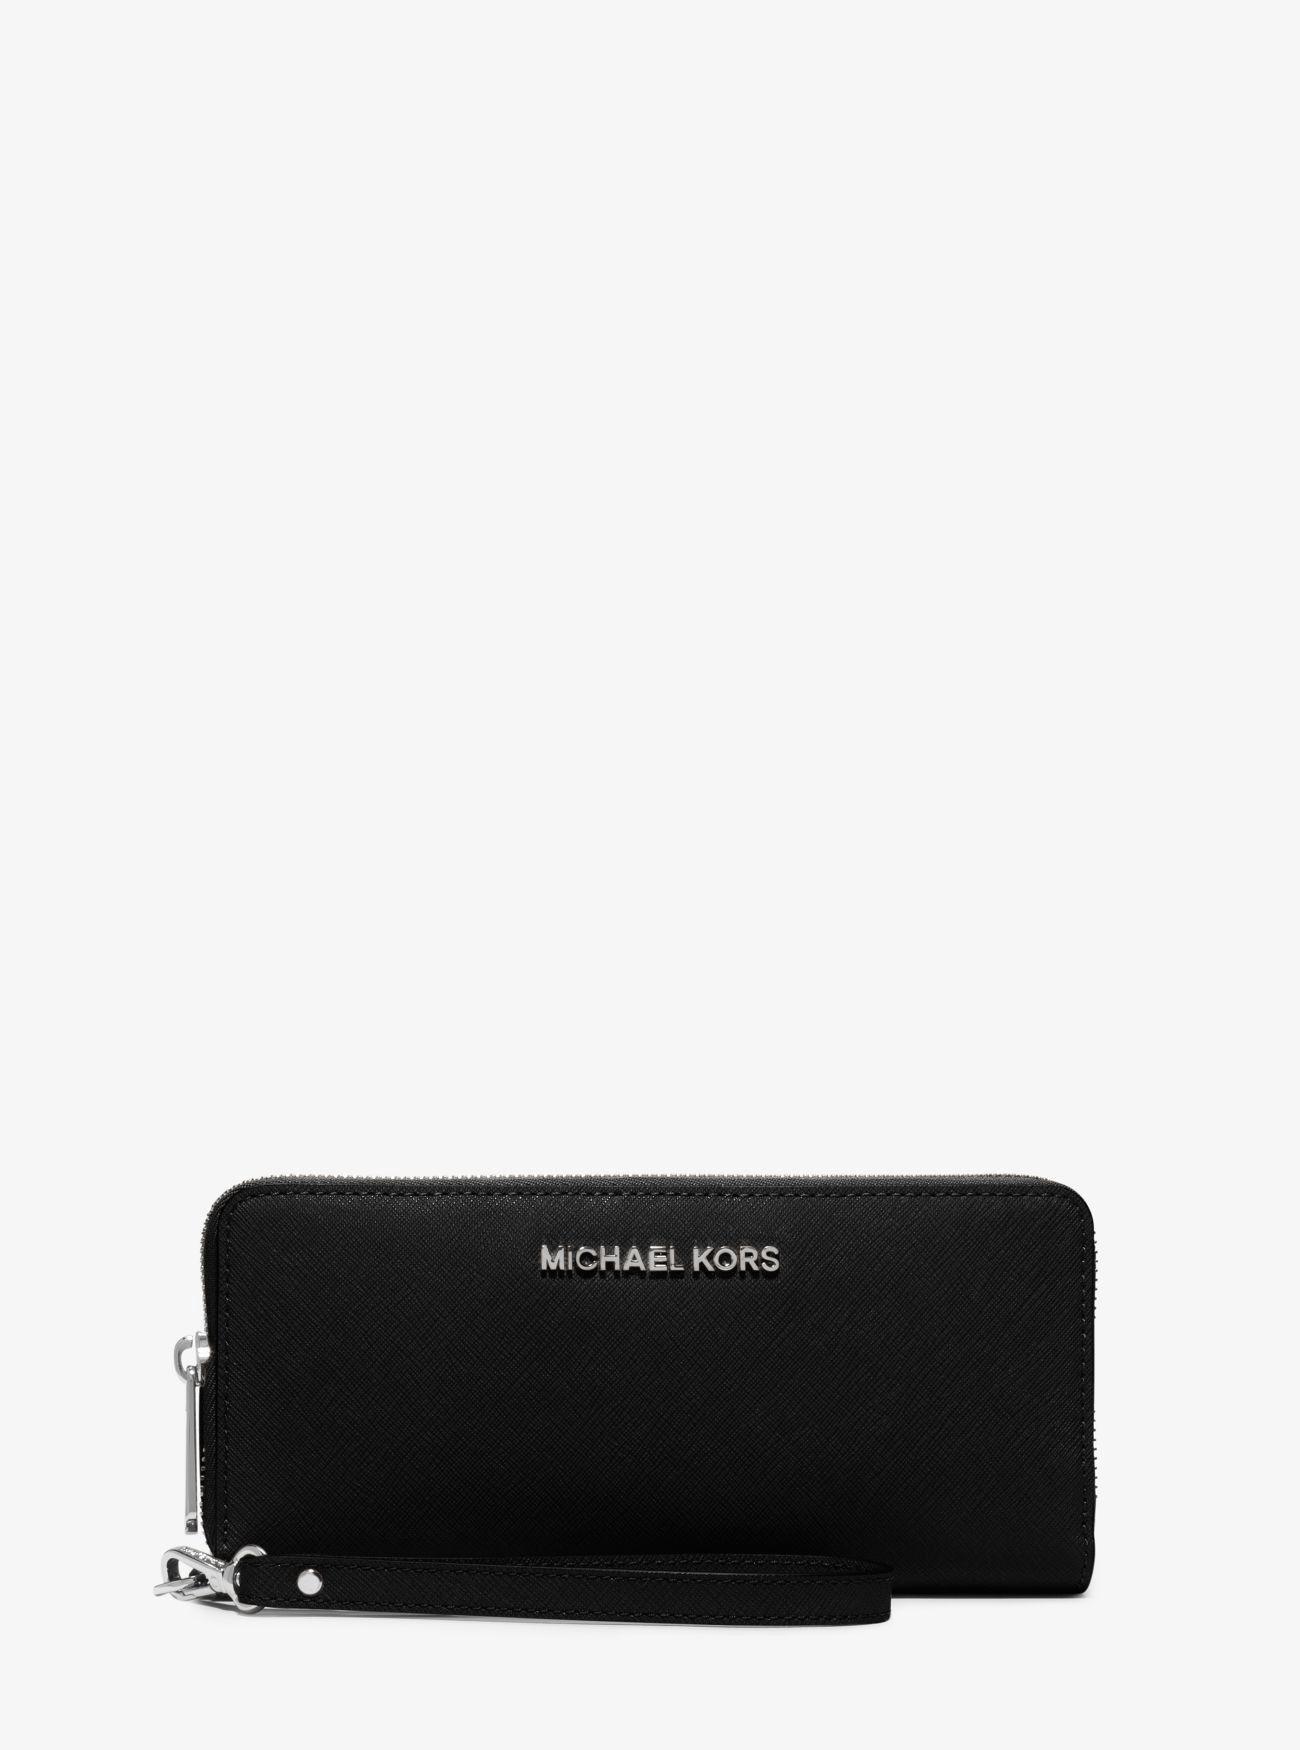 0edd00bd61c6 MICHAEL KORS Jet Set Travel Saffiano Leather Continental Wallet.   michaelkors  all